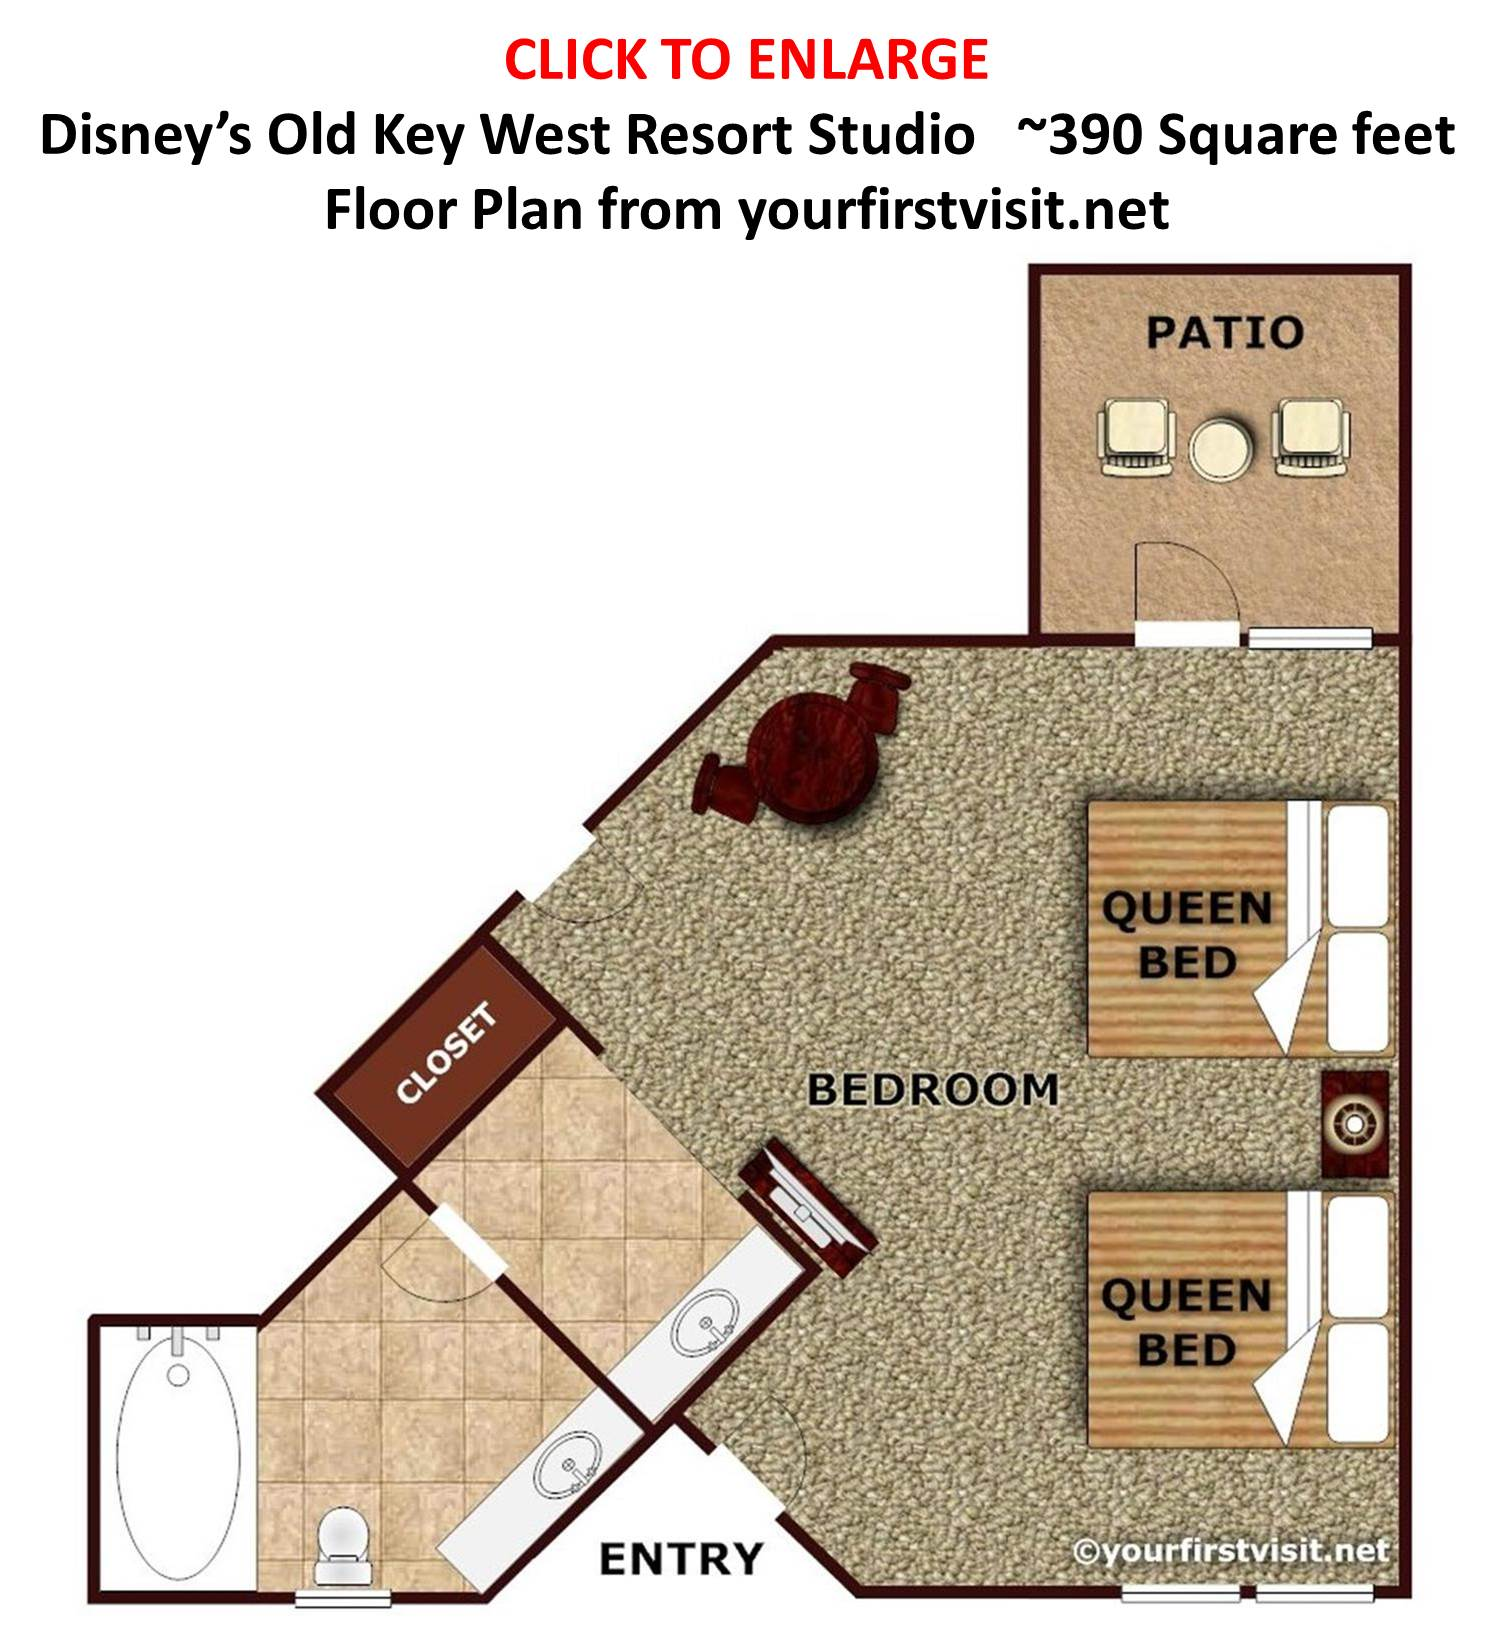 Review: Disney's Old Key West Resort - The Walt Disney